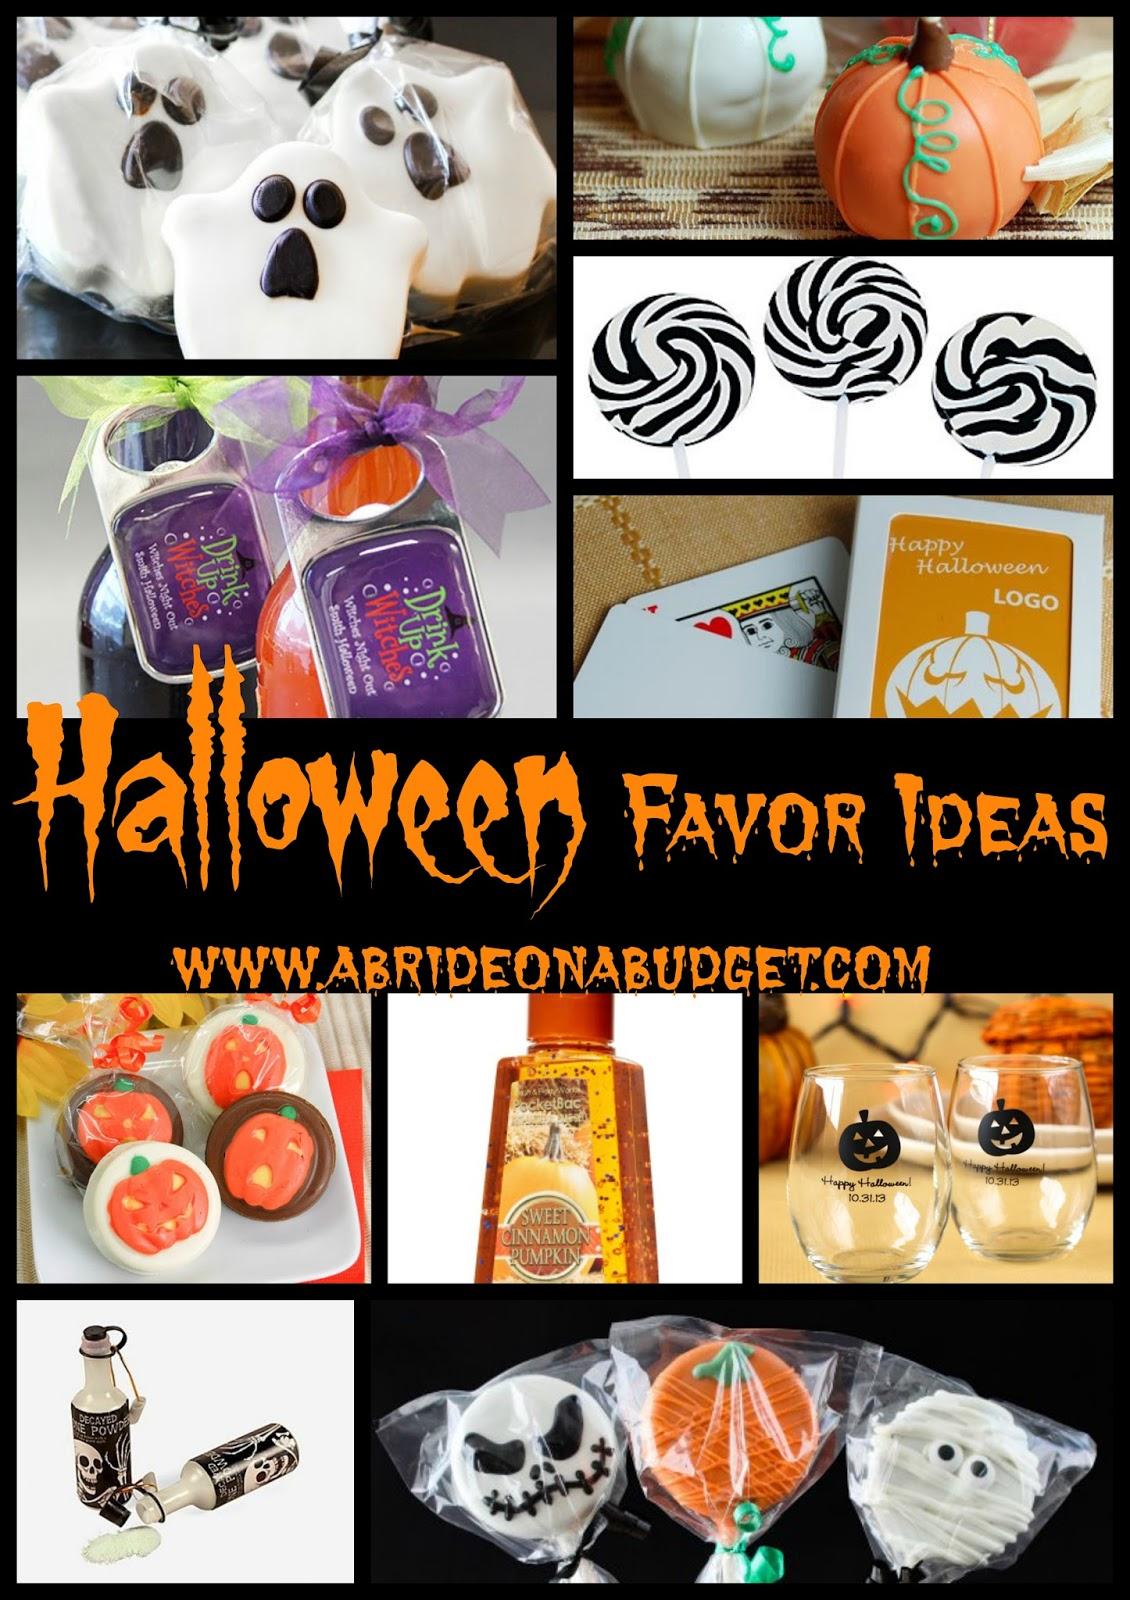 Planning a Halloween-themed wedding or a Halloween party? Check out these Halloween wedding favor ideas from www.abrideonabudget.com.